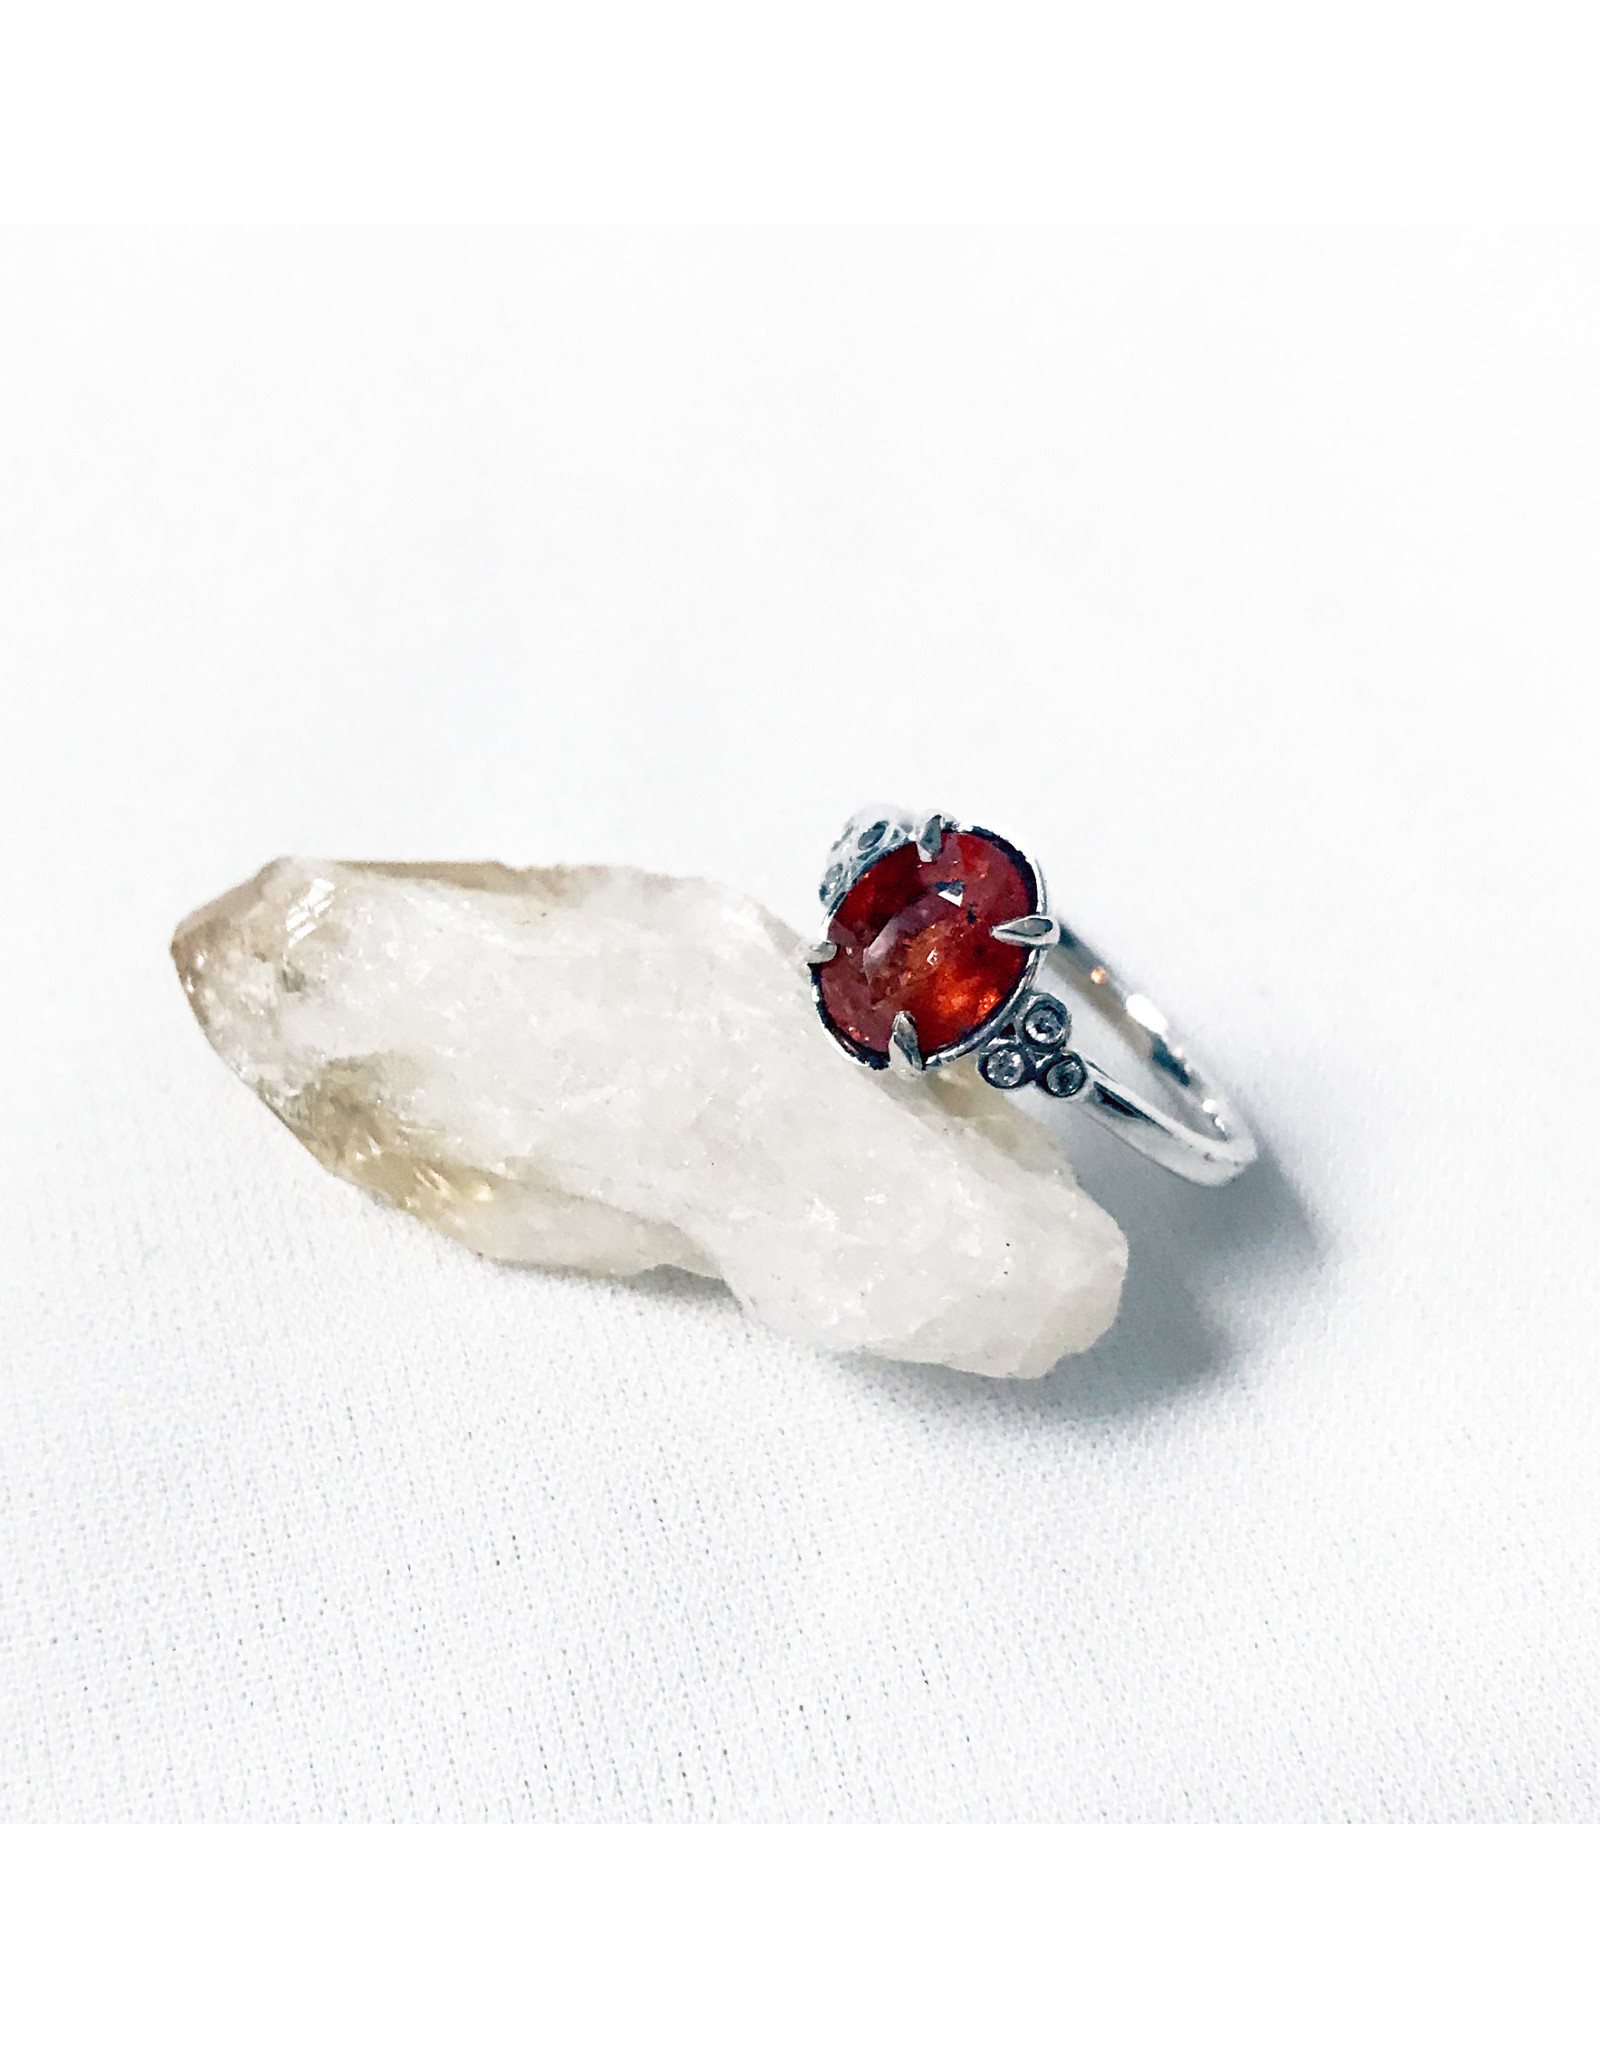 Chris Gillrie Fixed Start  Silver Ring, Spessartite Garnet, Cubic Zirconia Size 6